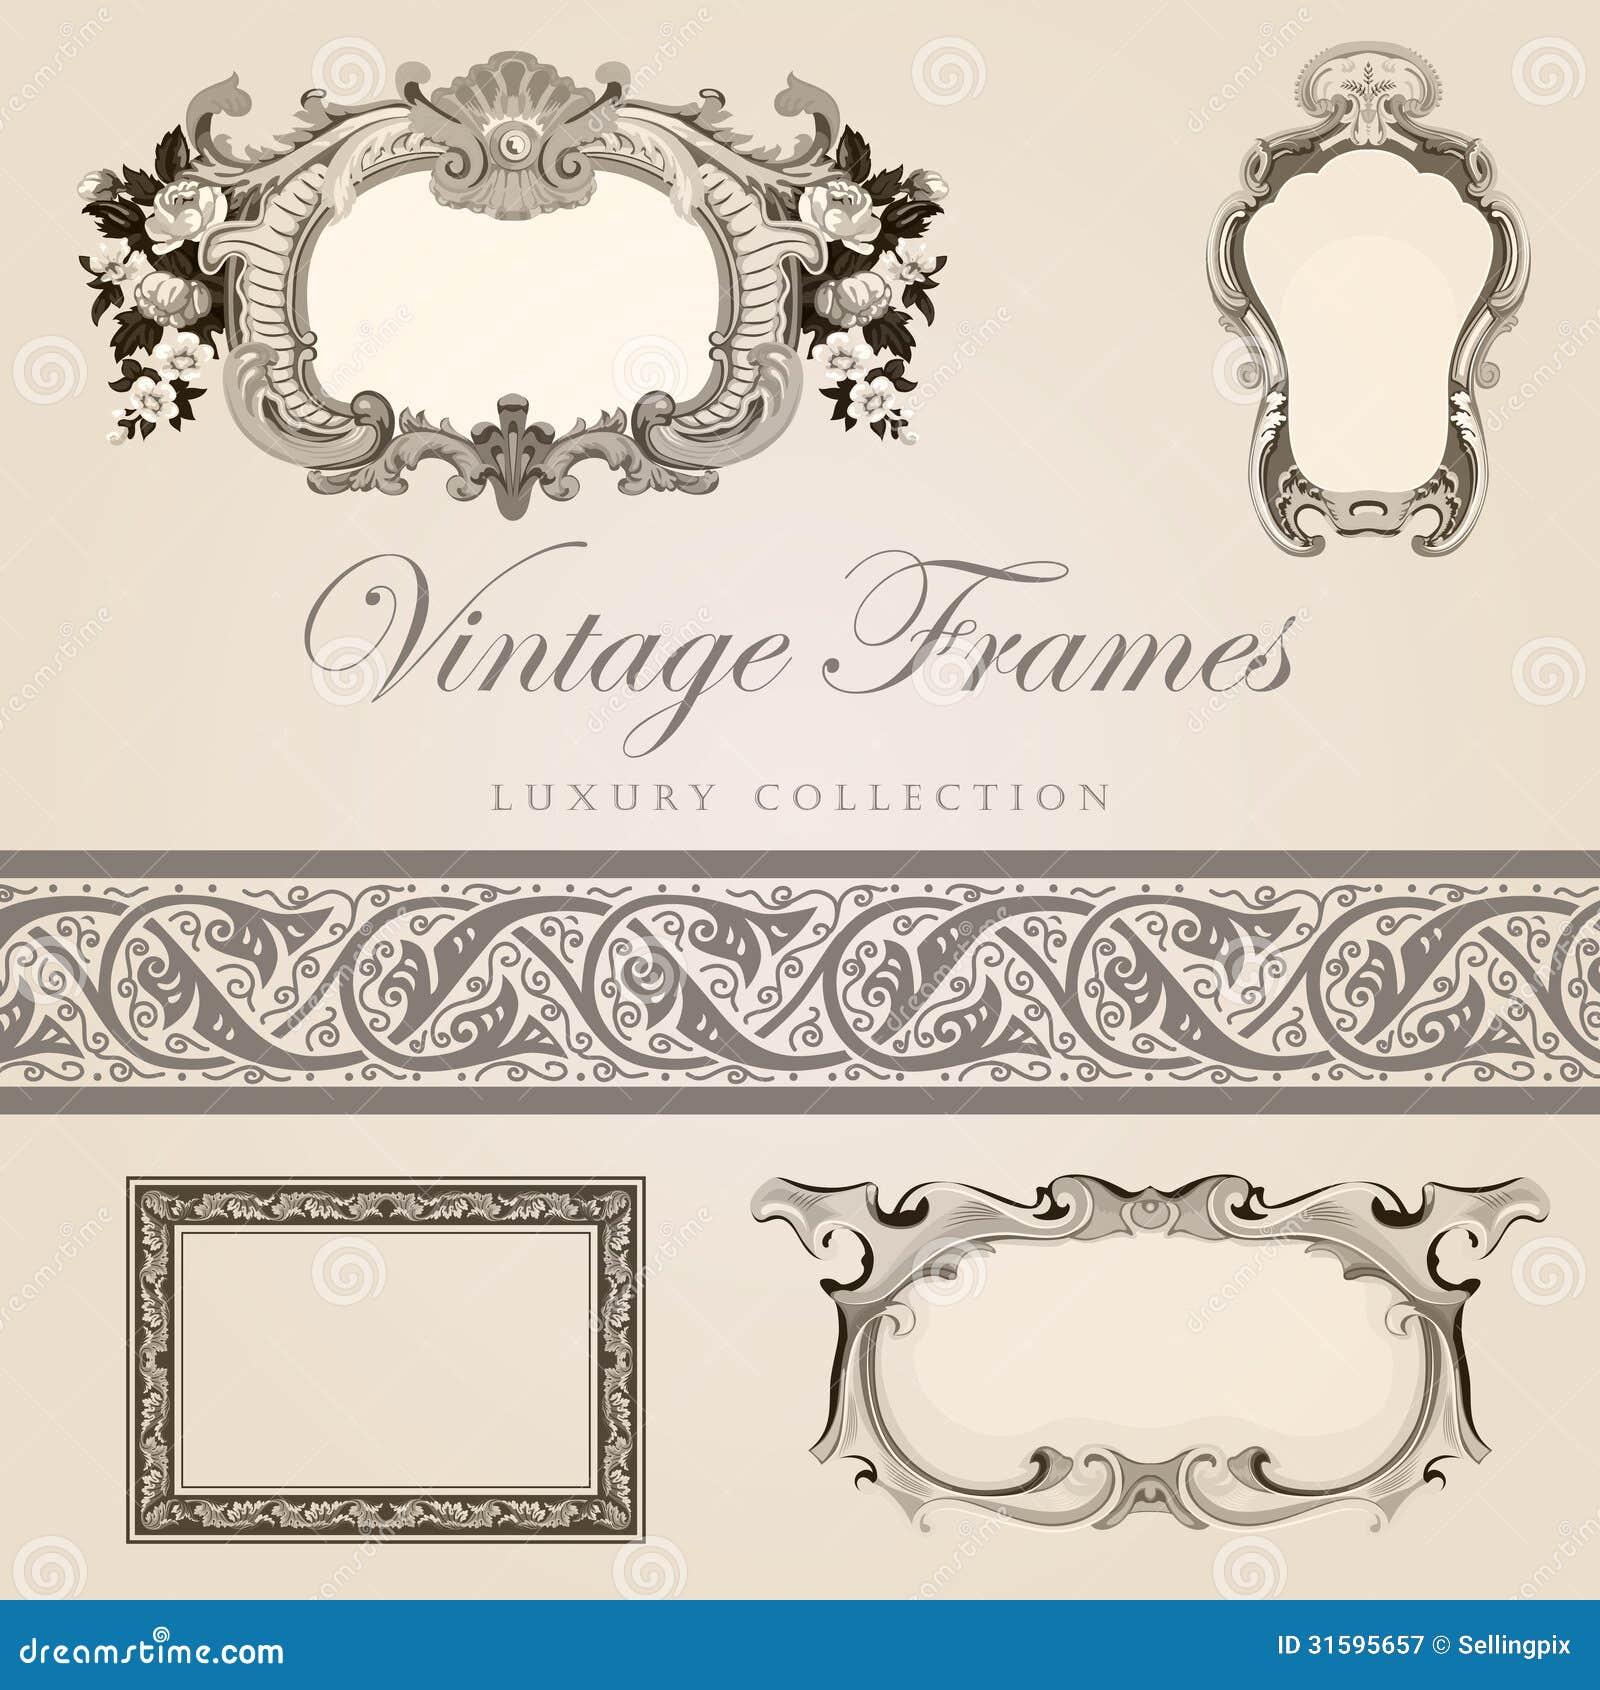 Retro Design Template Vintage Frames With Border Royalty